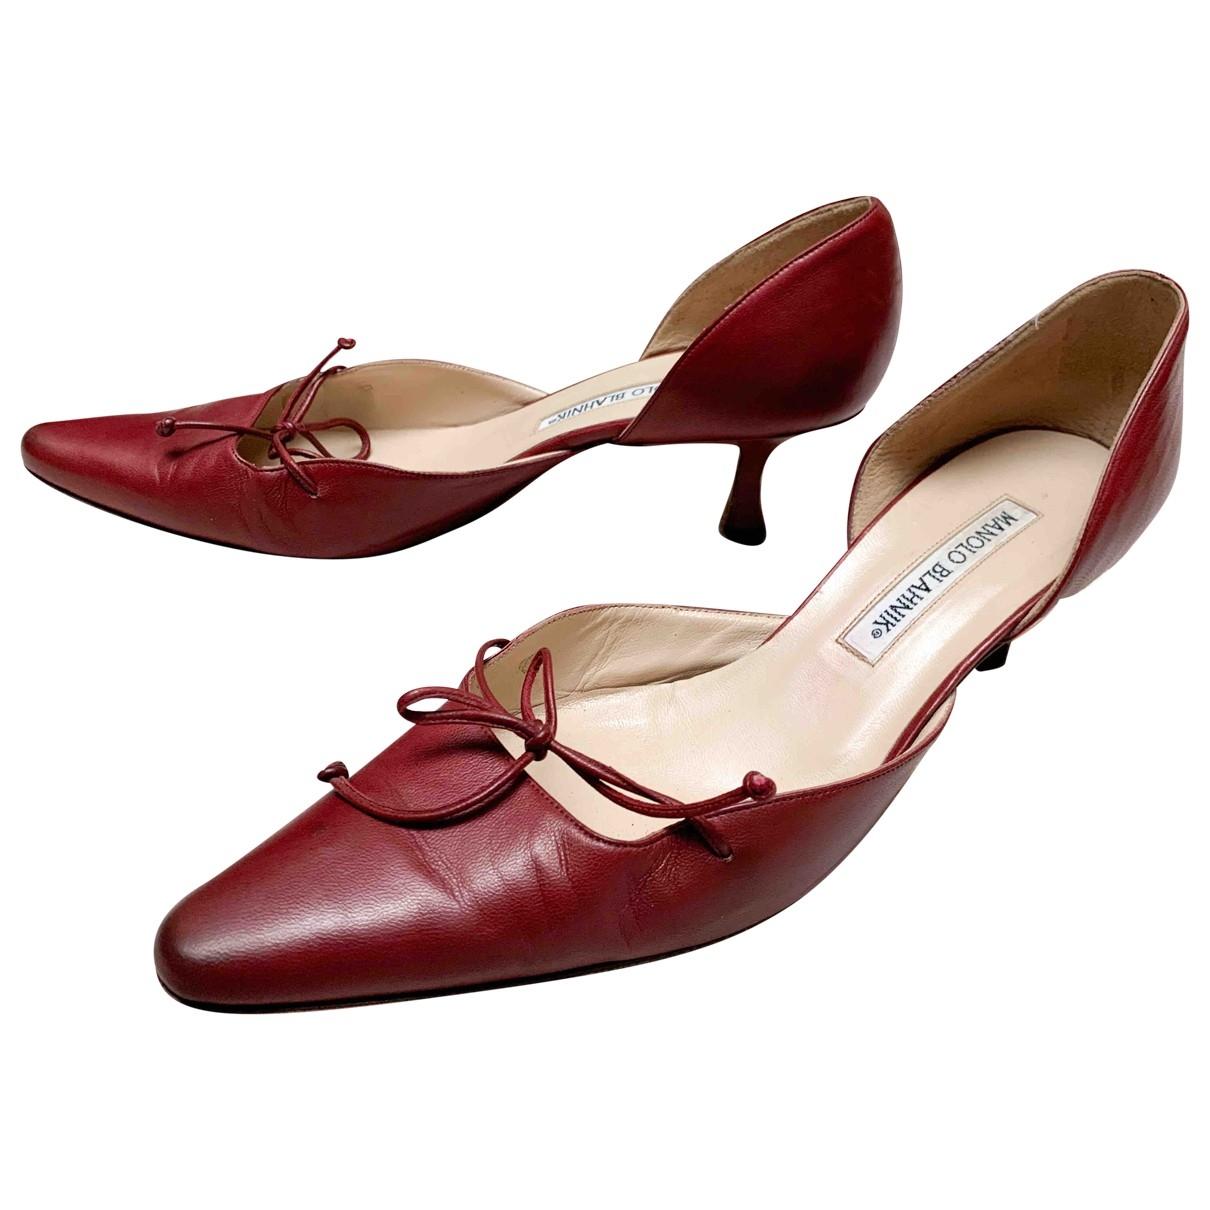 Manolo Blahnik \N Burgundy Leather Heels for Women 39 EU